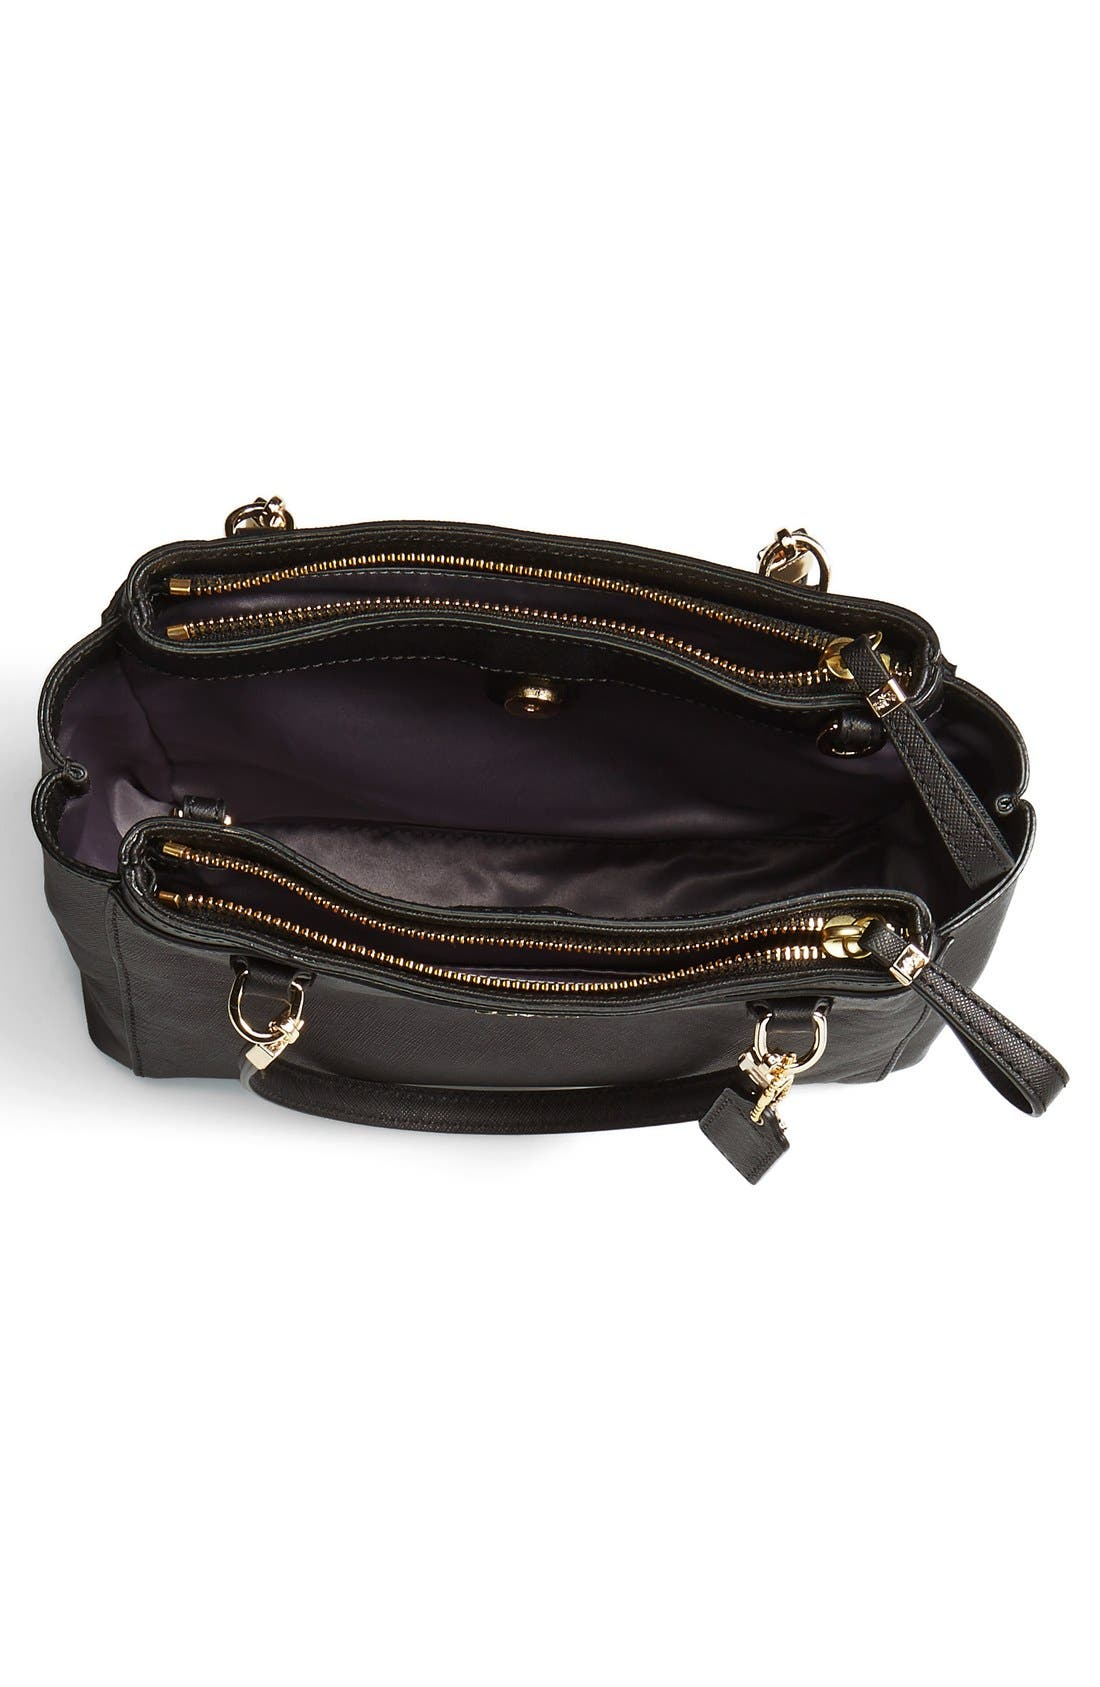 COACH, 'Madison - Mini Christie' Saffiano Leather Satchel, Alternate thumbnail 3, color, 001